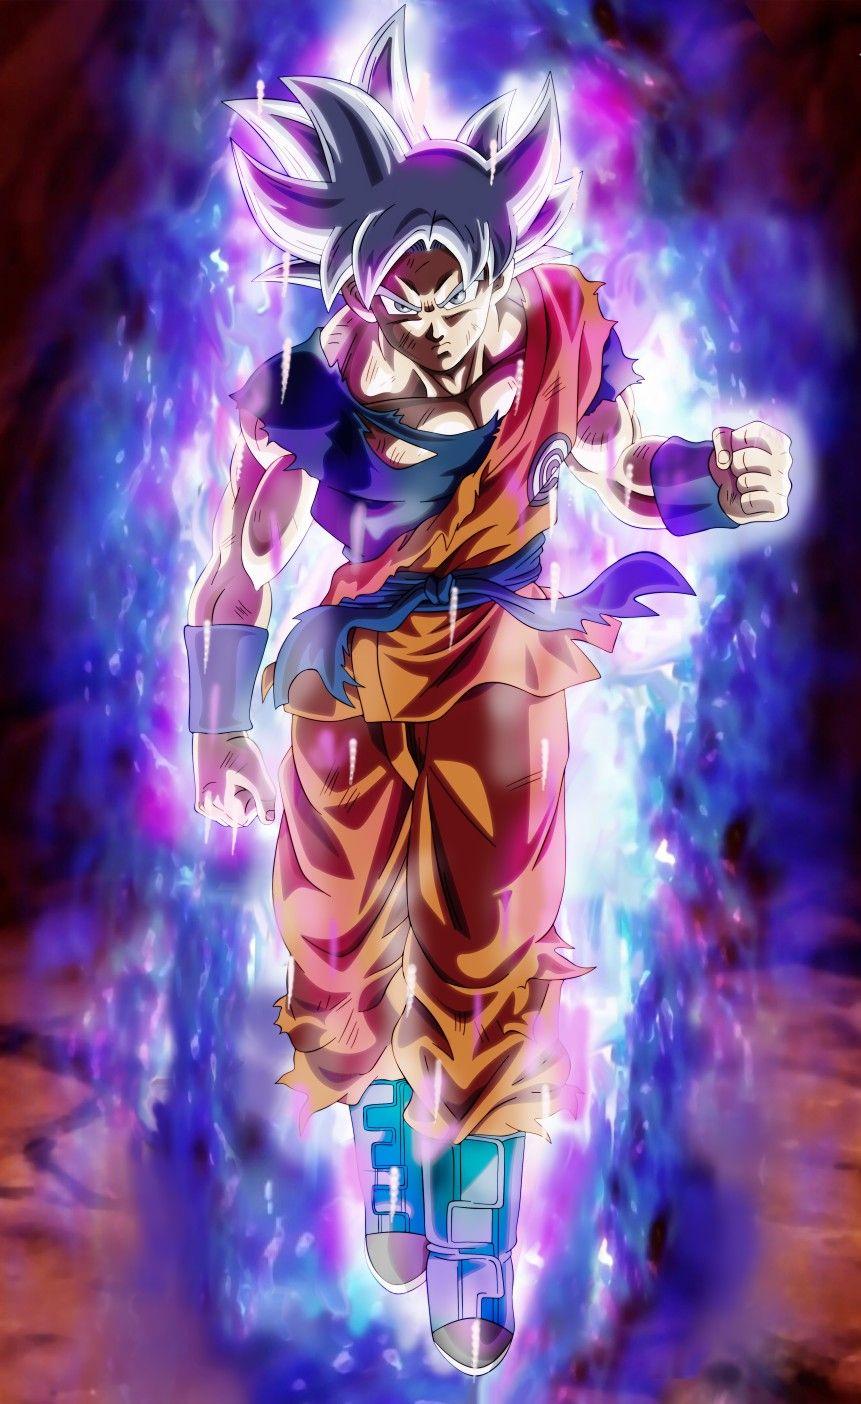 Ultra Instinct Son Goku Anime Dragon Ball Anime Dragon Ball Super Dragon Ball Image